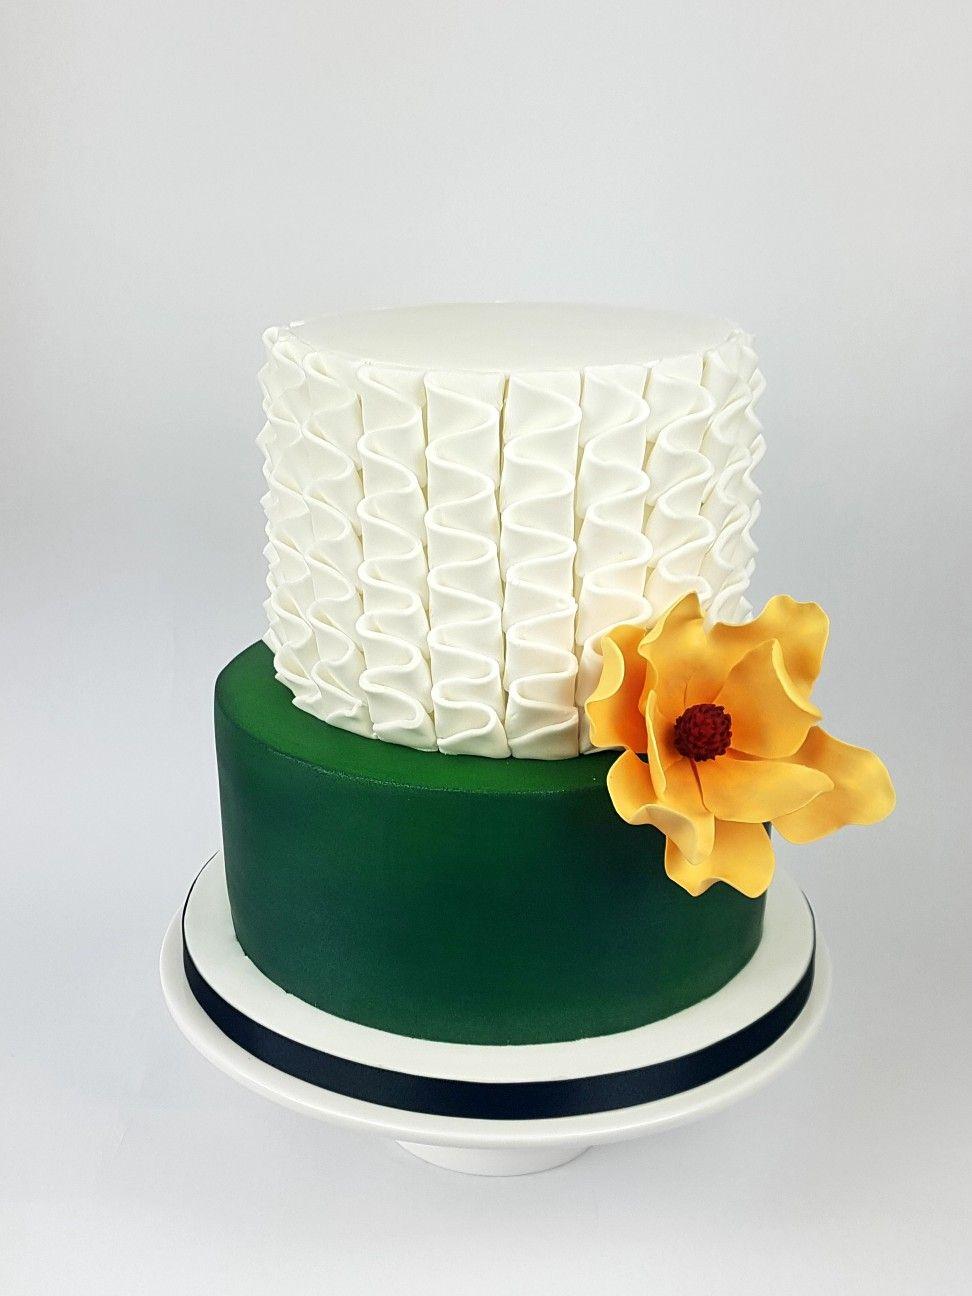 Astounding Womans Birthday Cake Ideas Pleated Fondant Green Cake Sugar Personalised Birthday Cards Epsylily Jamesorg